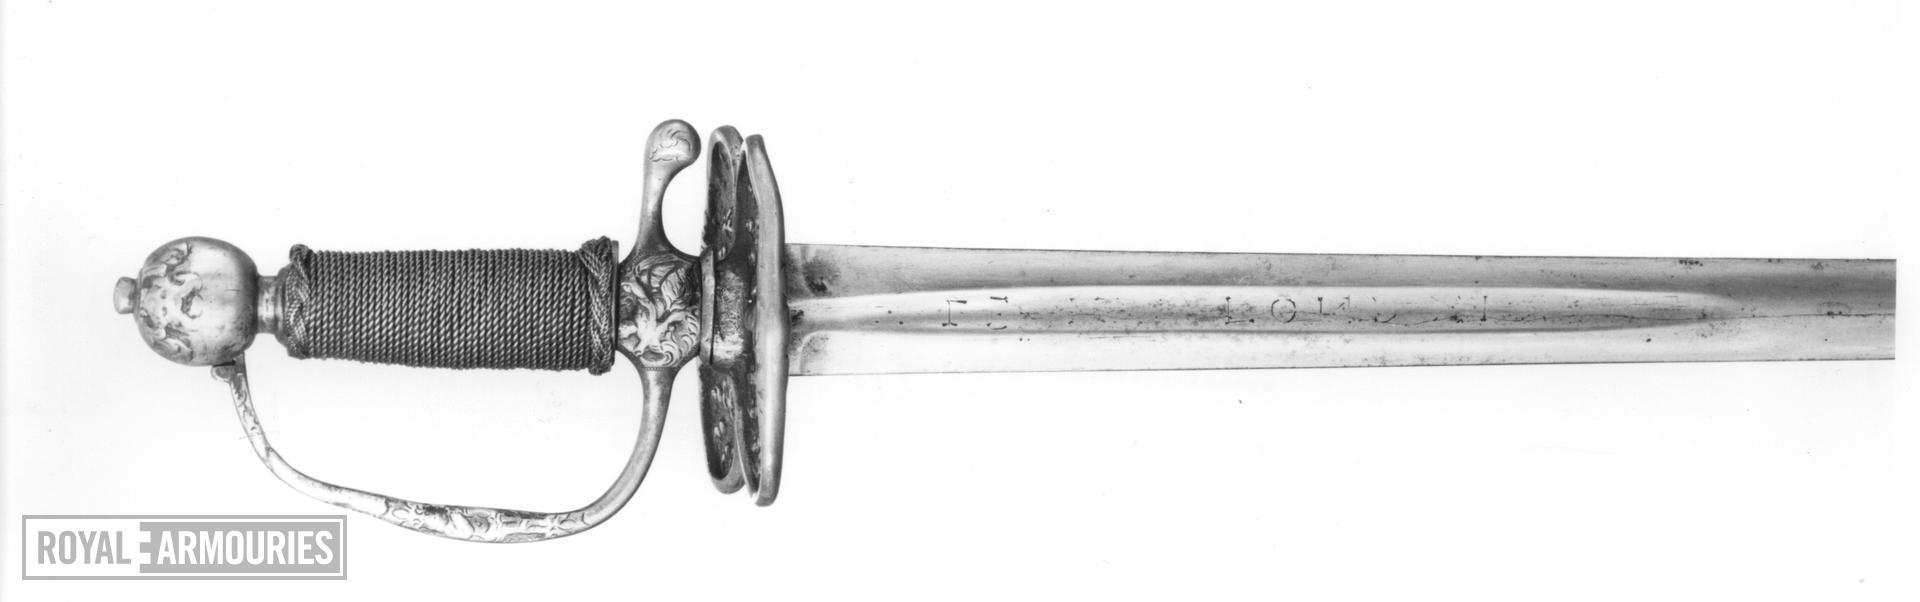 Sword Sword by John Bell